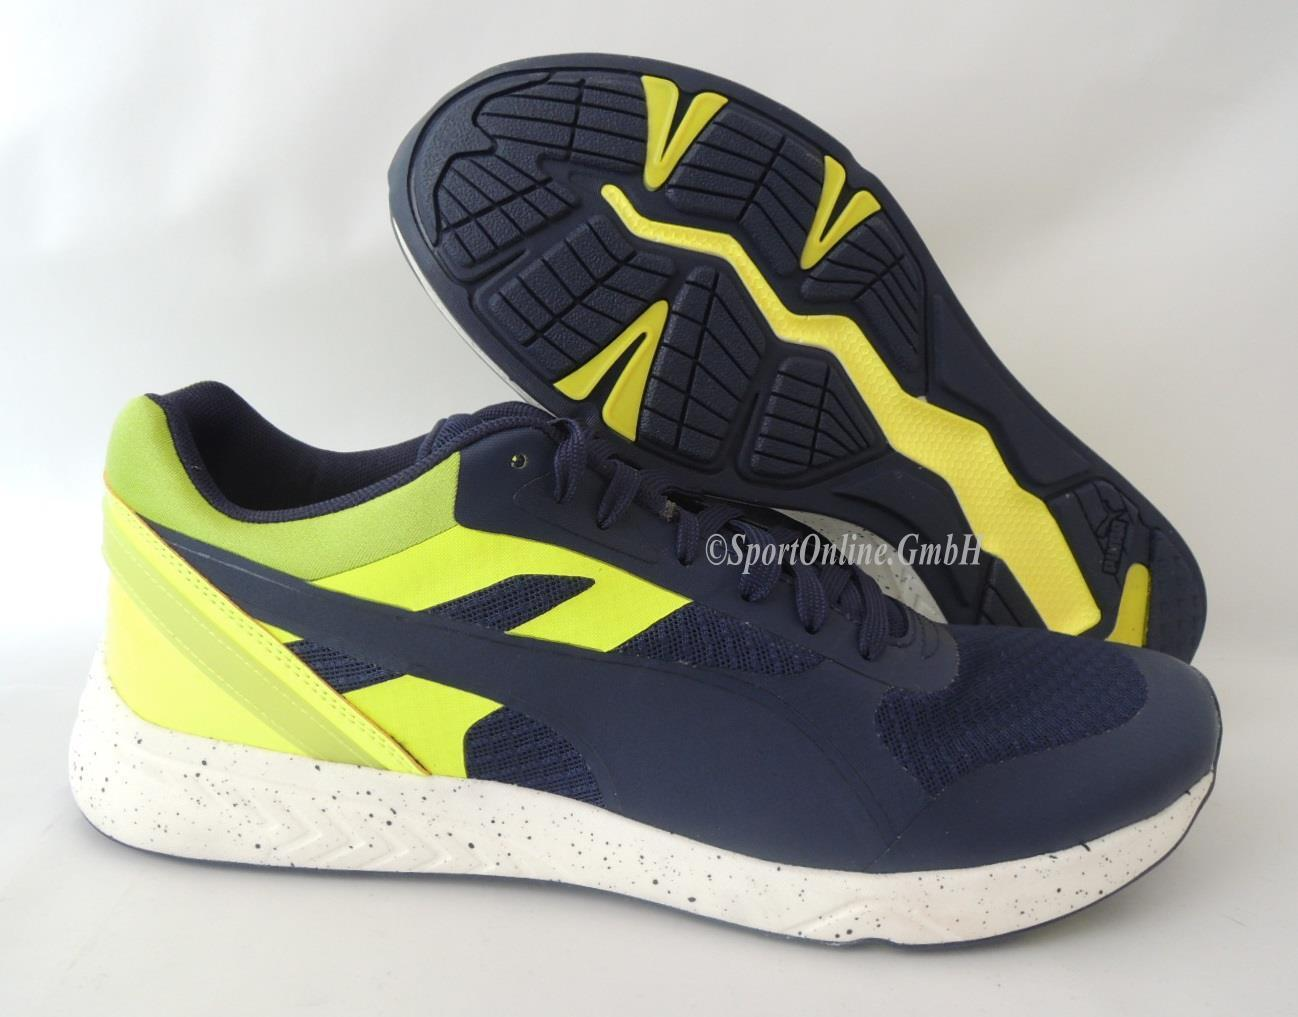 NEU Puma 698 Ignite Gr. 46 Herren Laufschuhe Sneaker Sportschuhe 360063-06